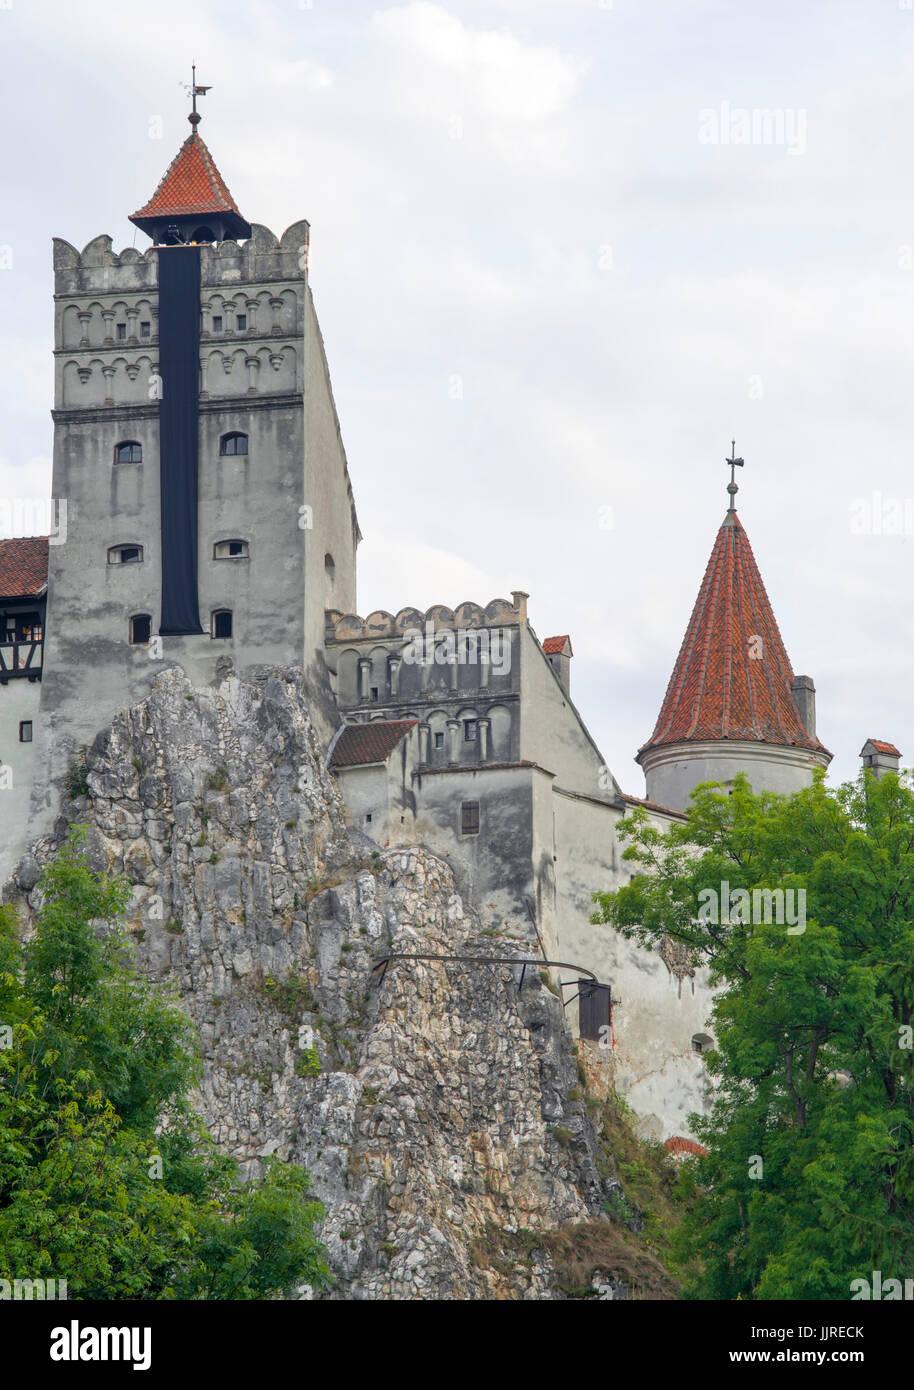 Draculas Schloss (Schloss Bran), di. Residenz von Vlad Tepes, gebaut auf einem riesigen Felsen. Stockbild